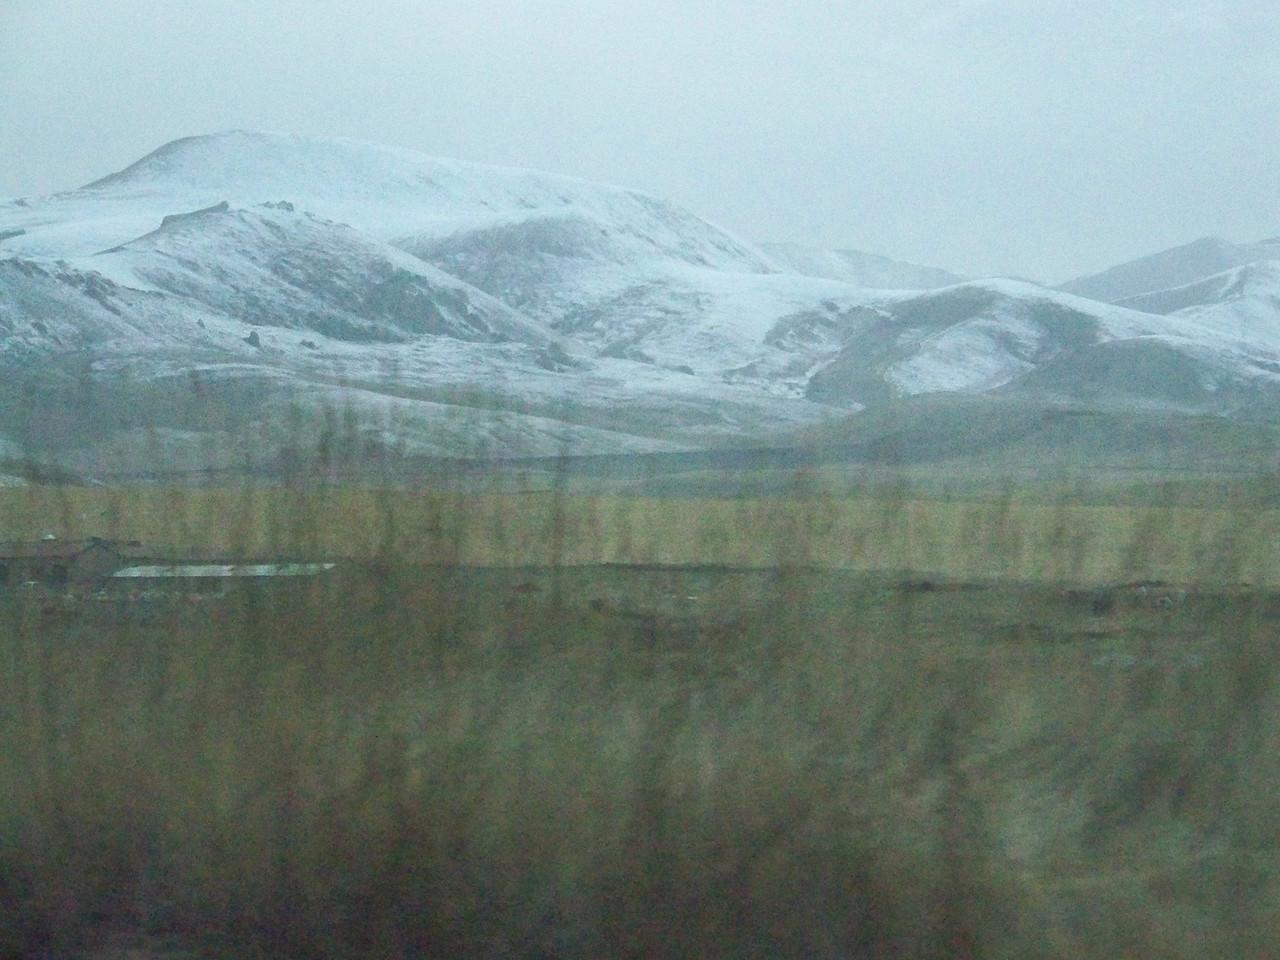 0094 - Scenery on Train Trip Between Beijing and Lhasa.JPG